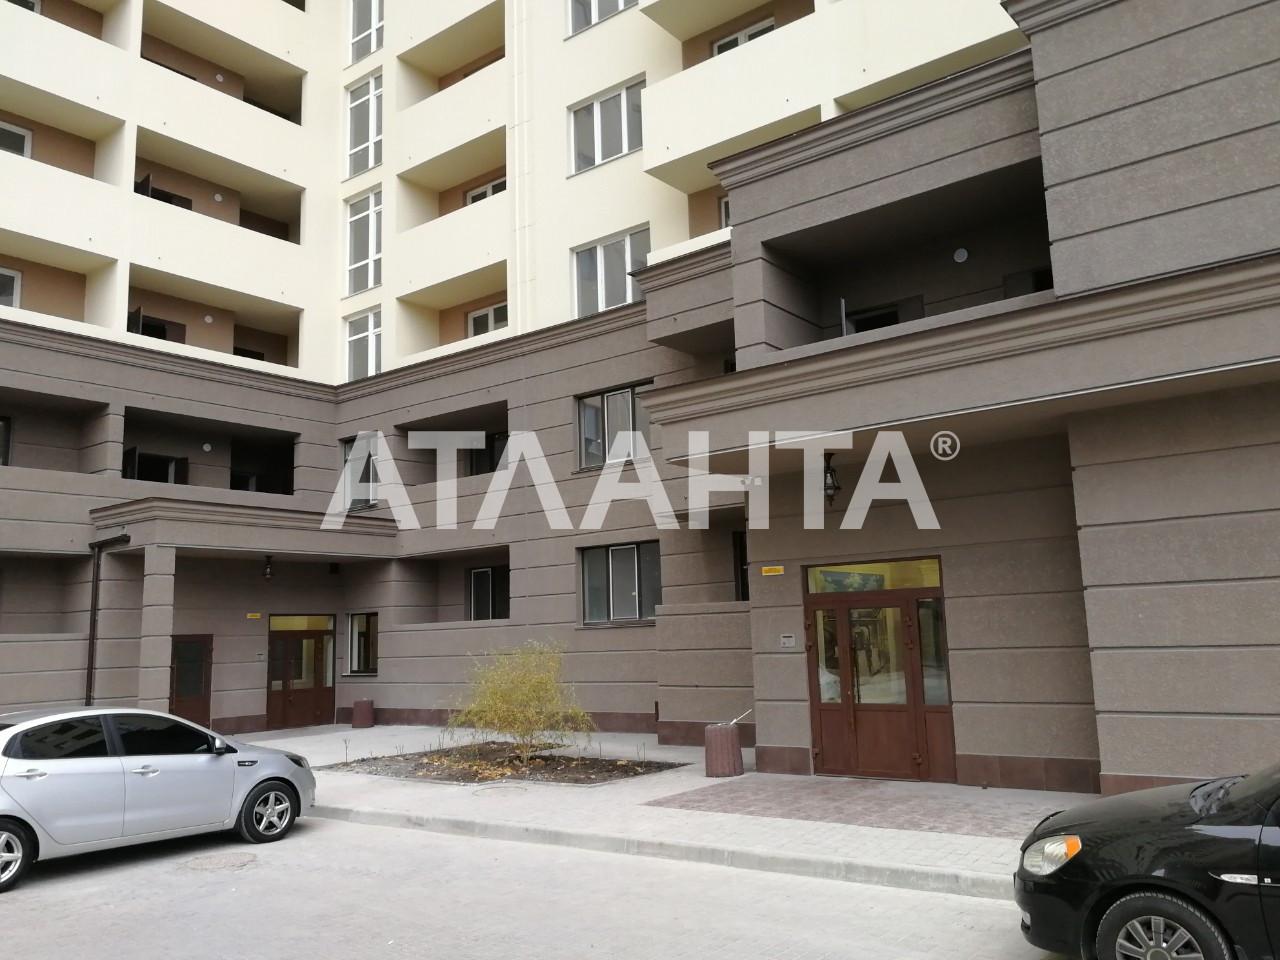 Продается 3-комнатная Квартира на ул. Воробьева Ак. — 58 300 у.е. (фото №3)